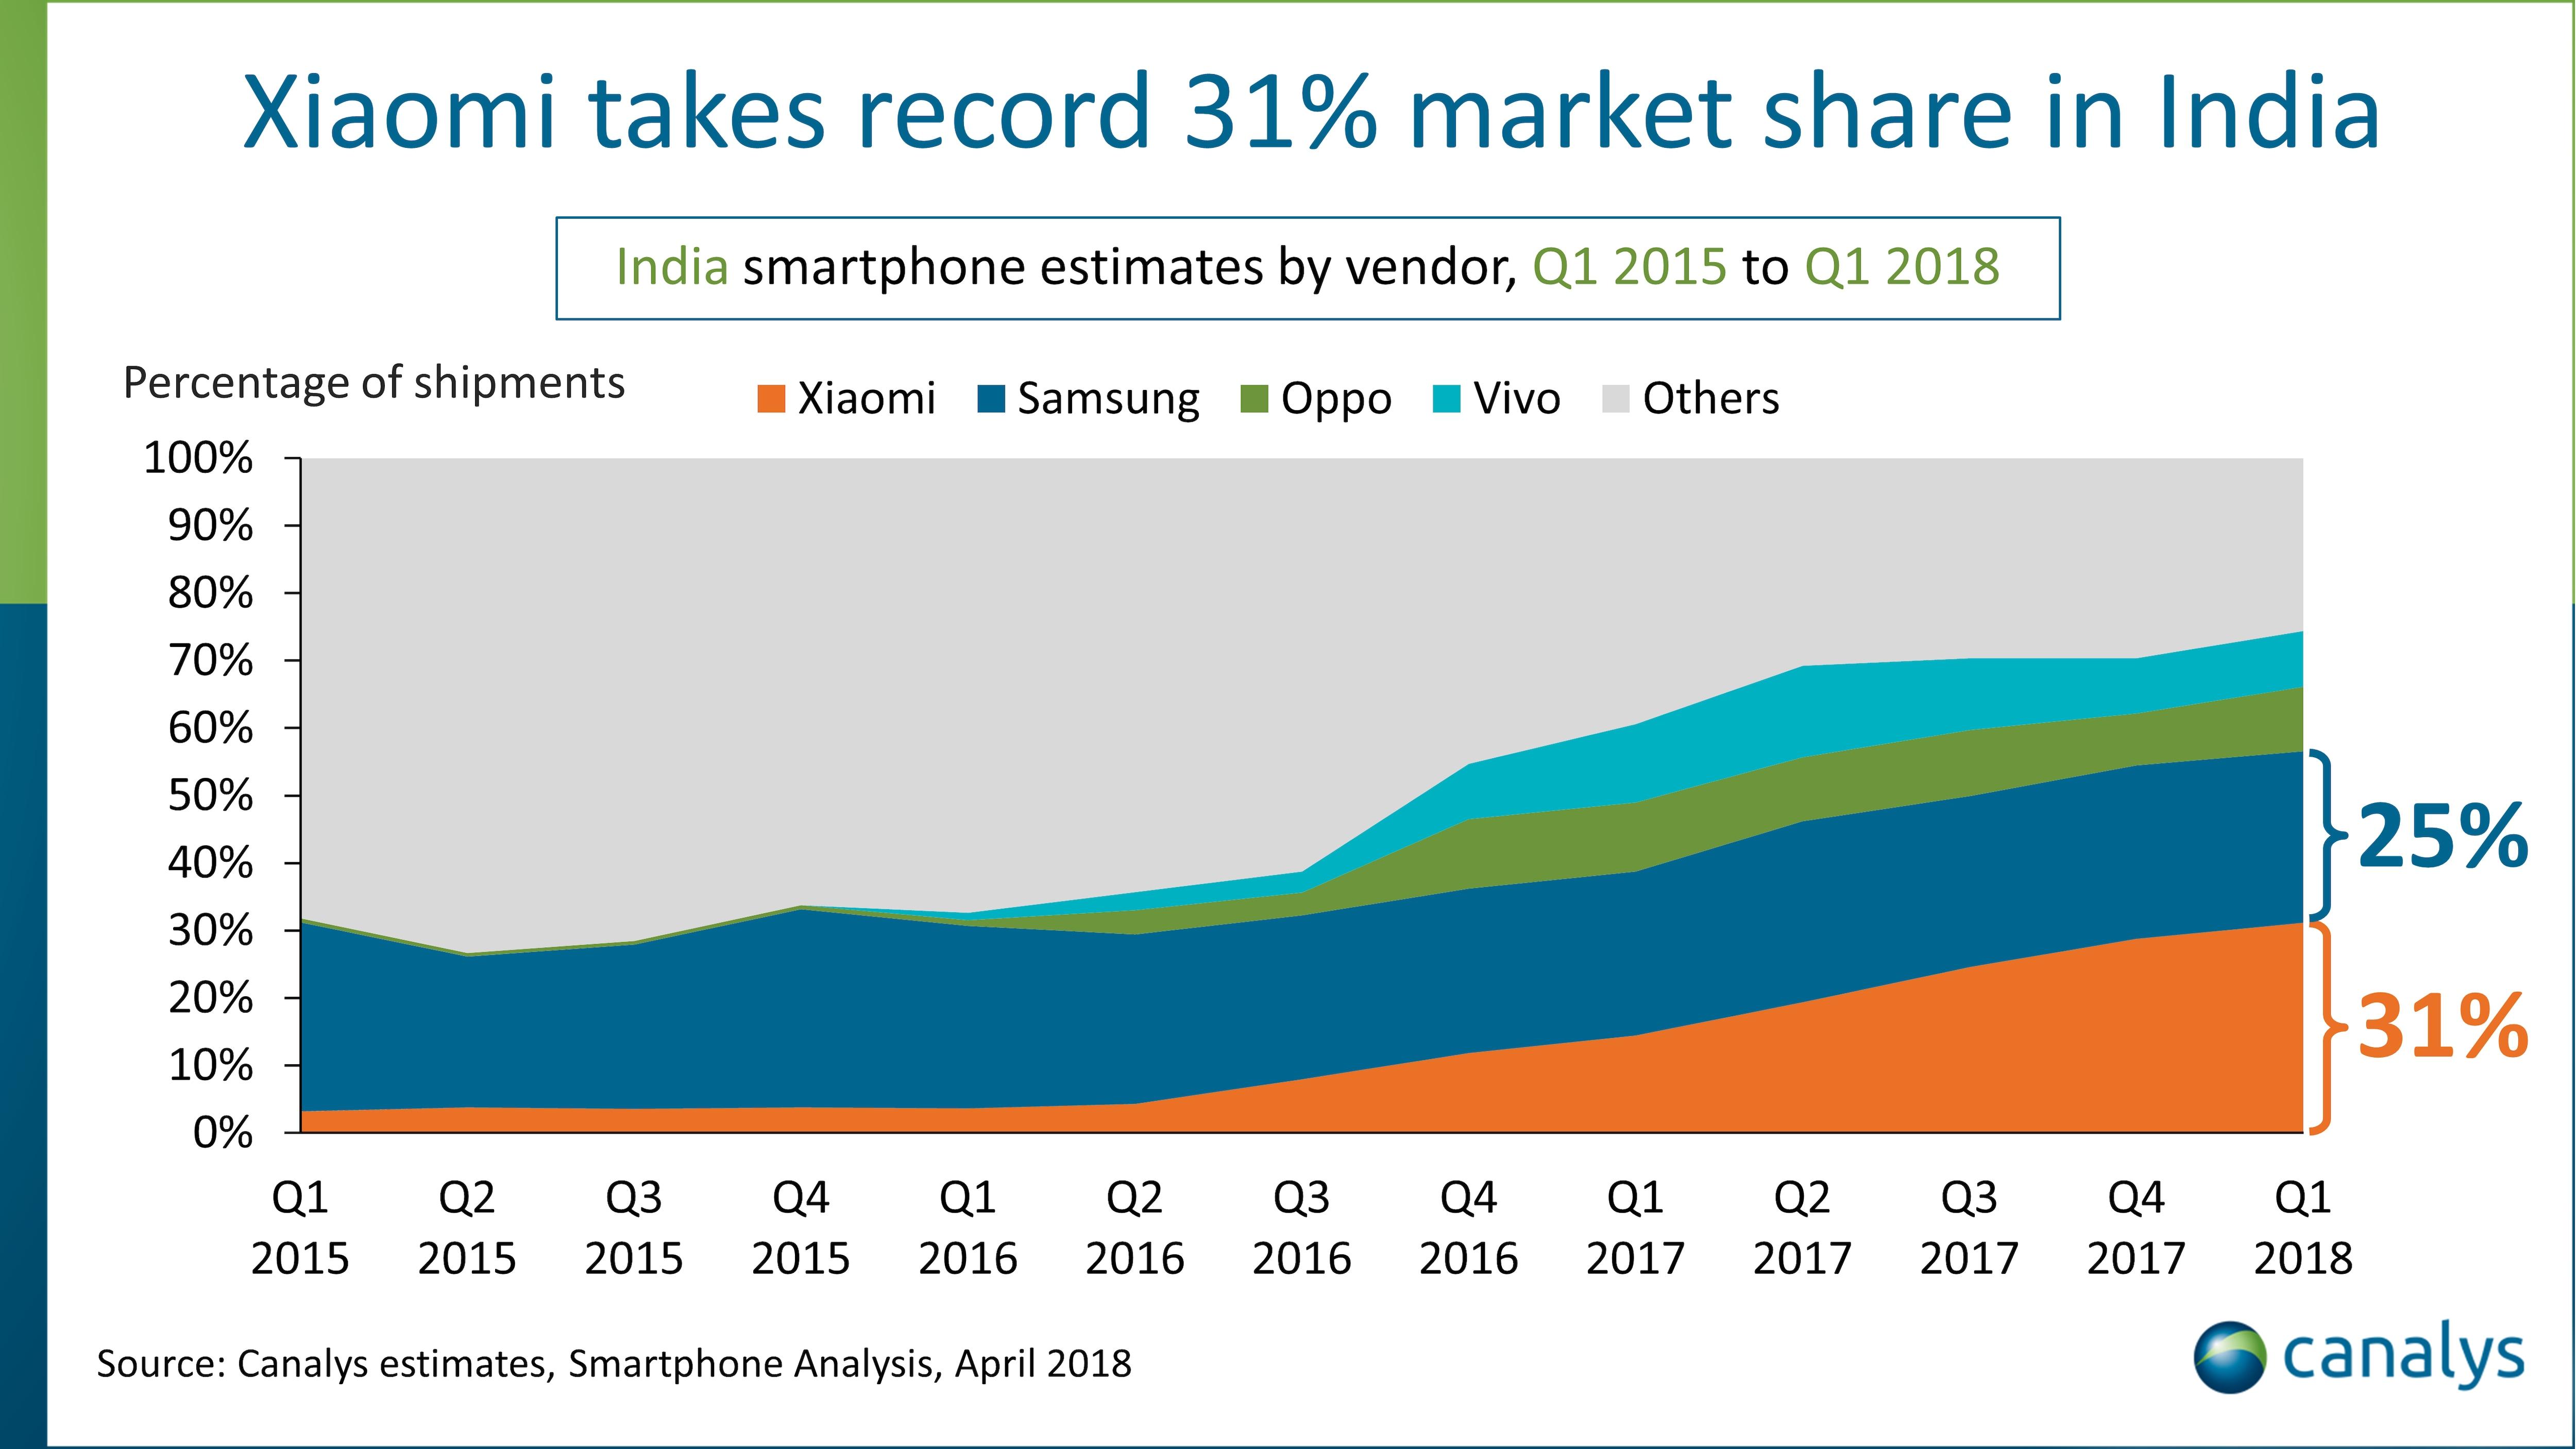 mercato-smartphone-india-q1-2018-canalys